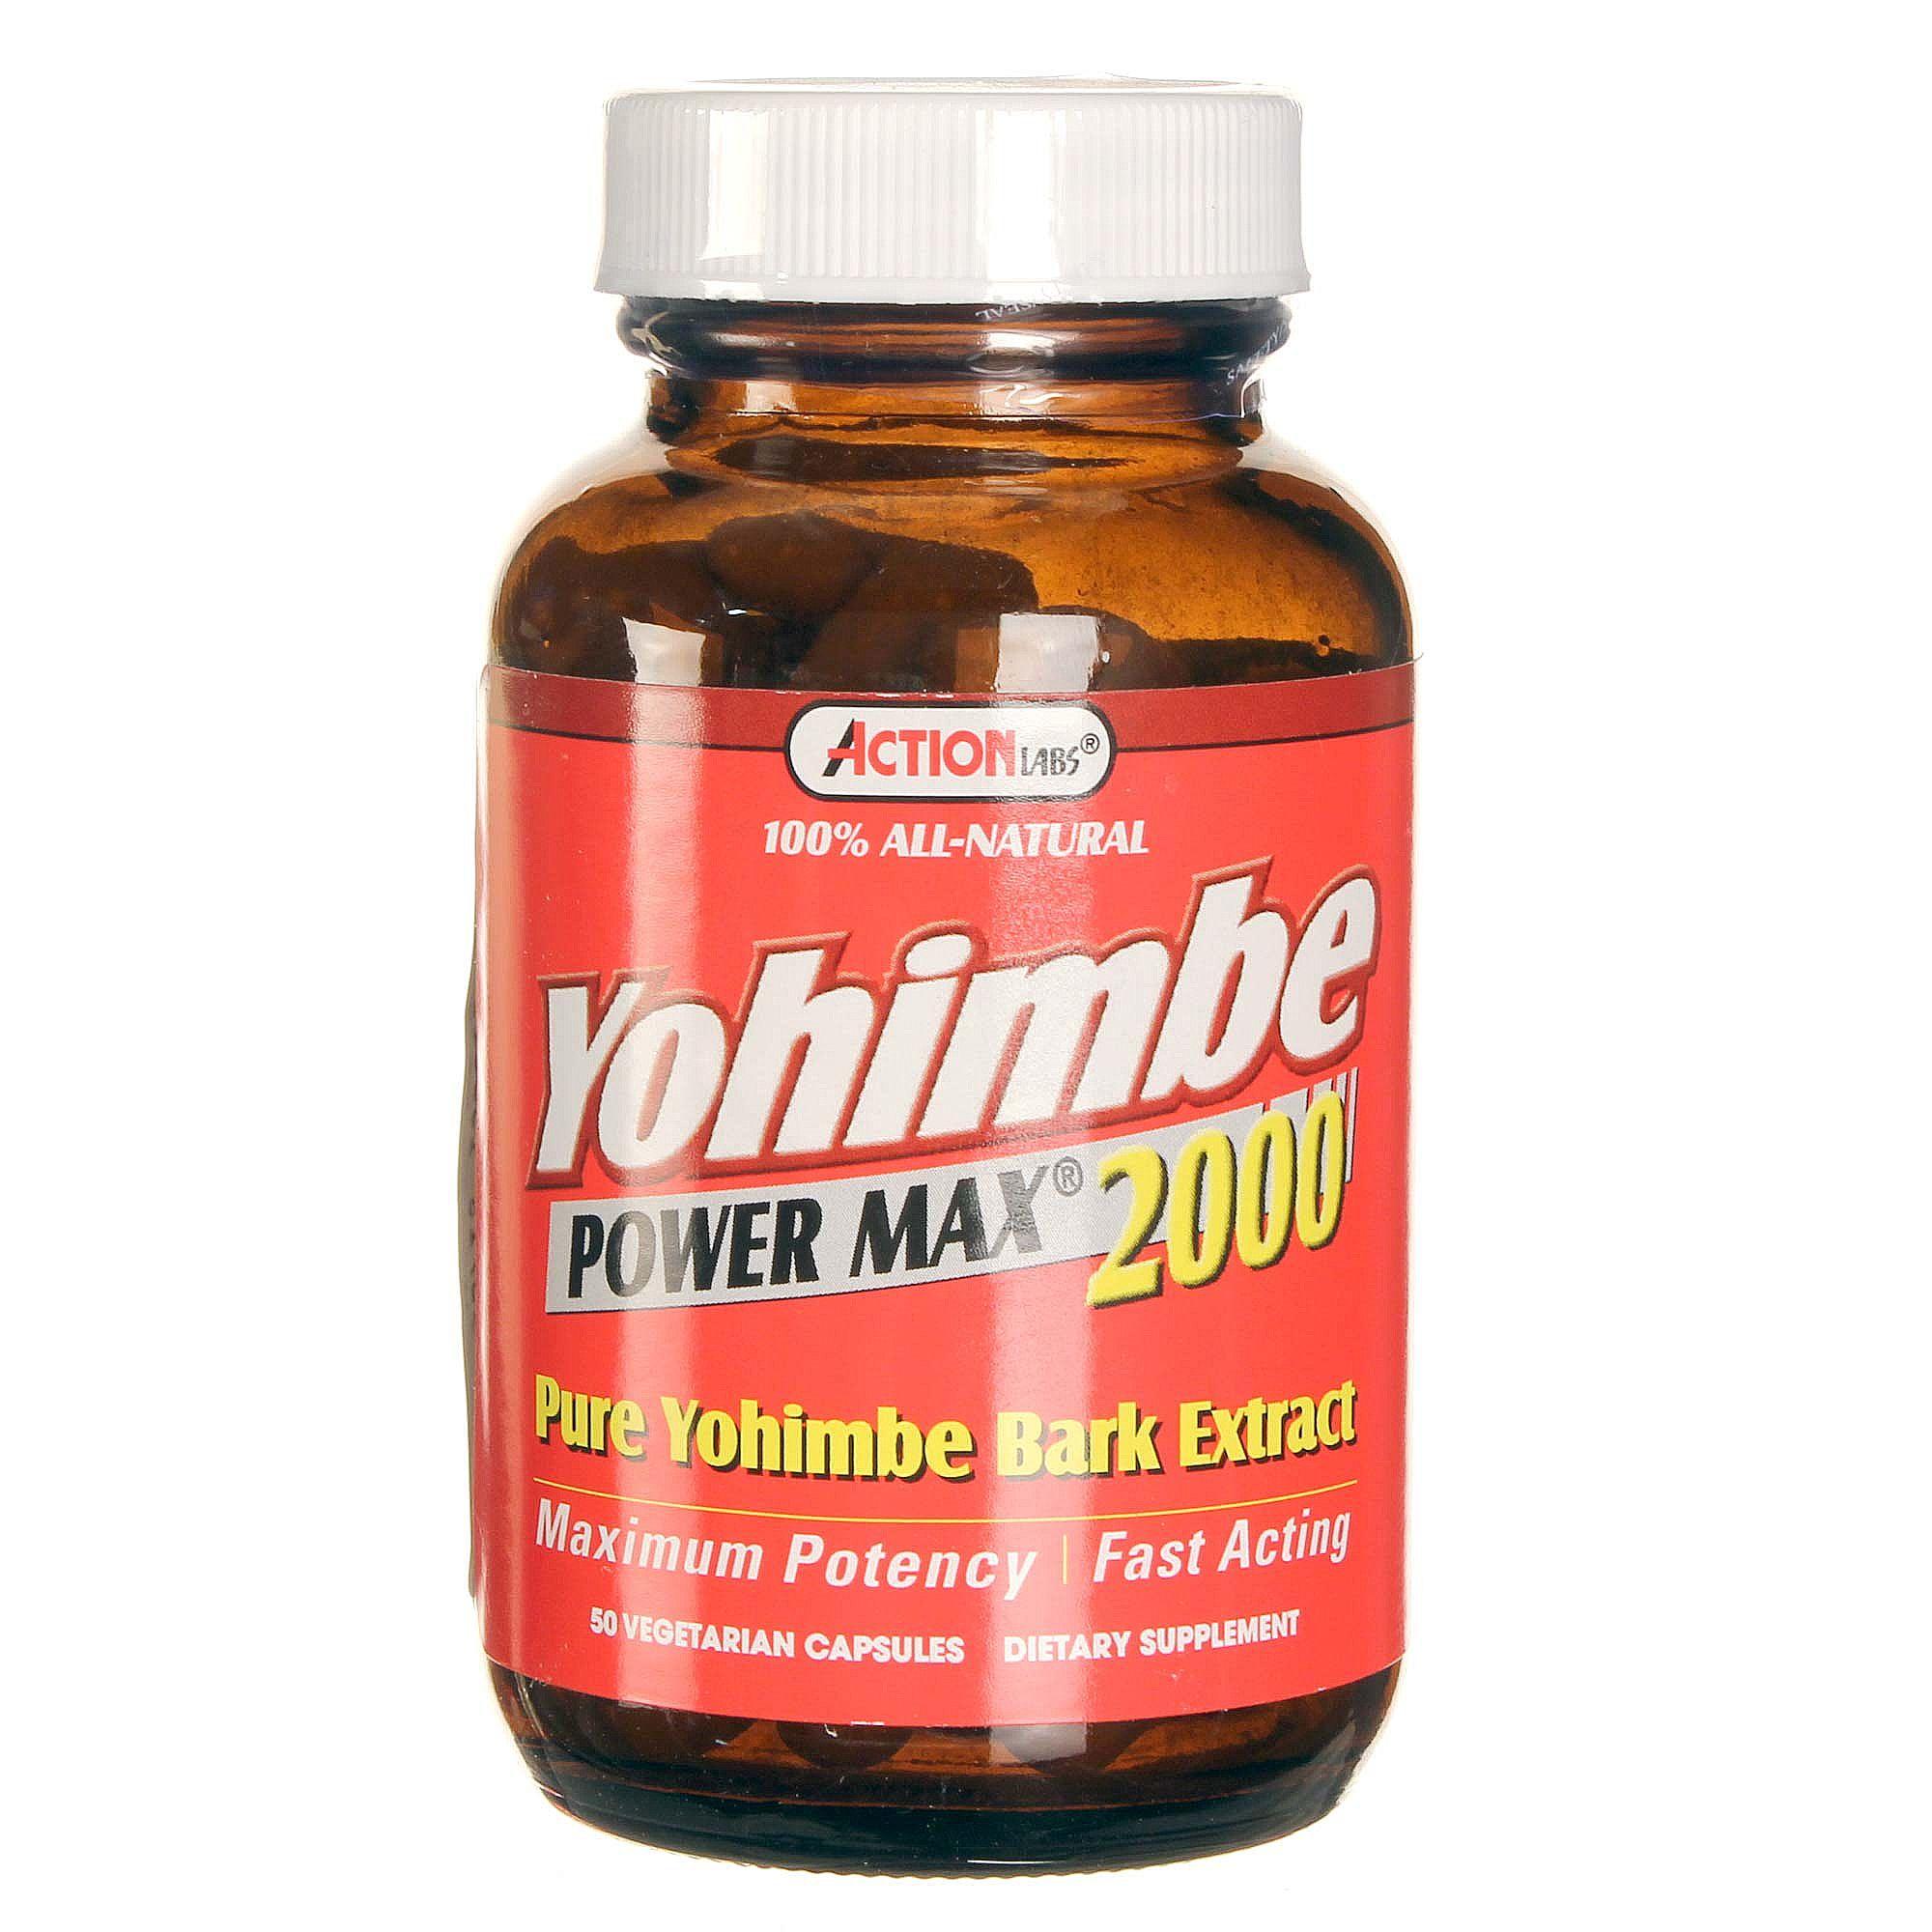 Yohimbe pill